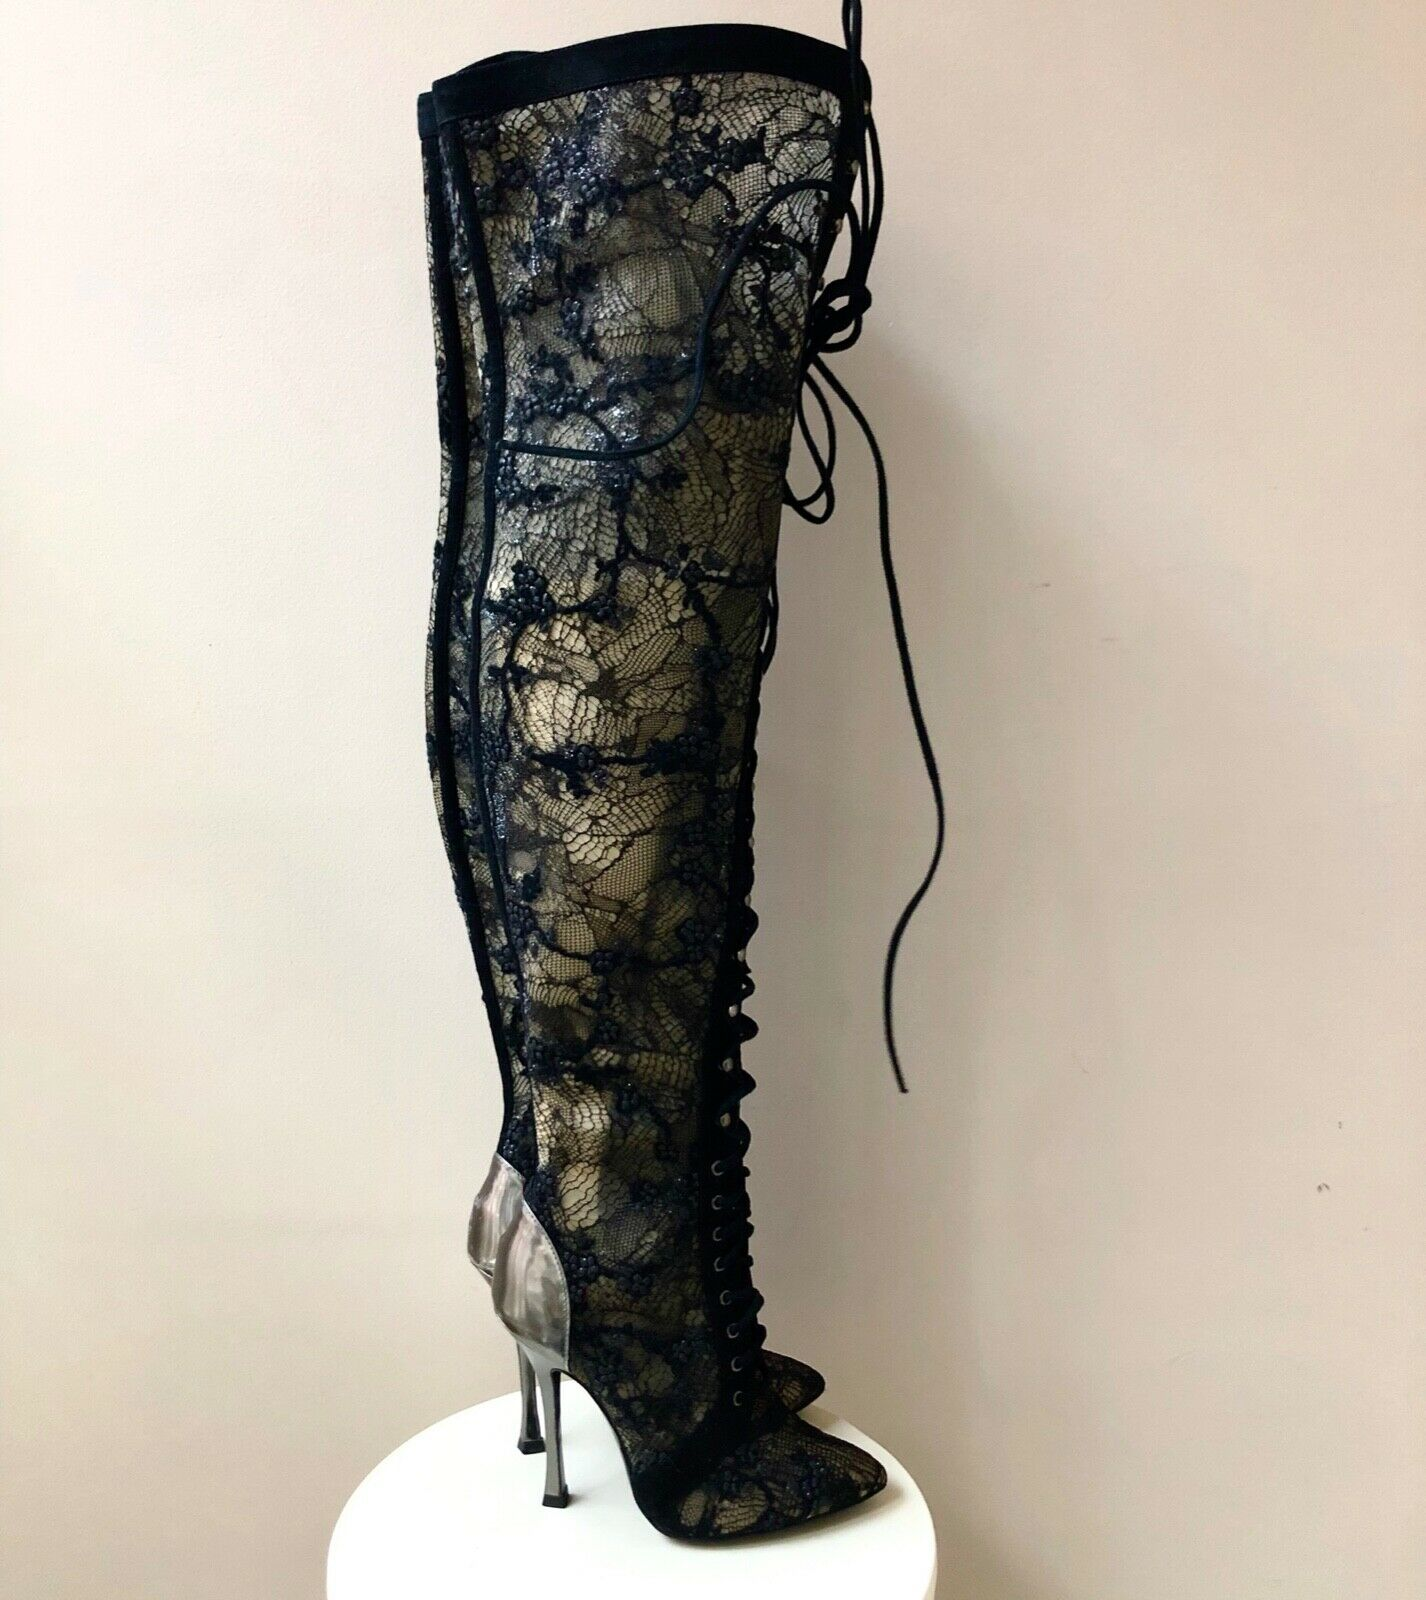 SERGIO ROSSI Overknee Stiefel Gr. D 36,5 Schwarz Spitze Damen Schuhe schuhe Lace